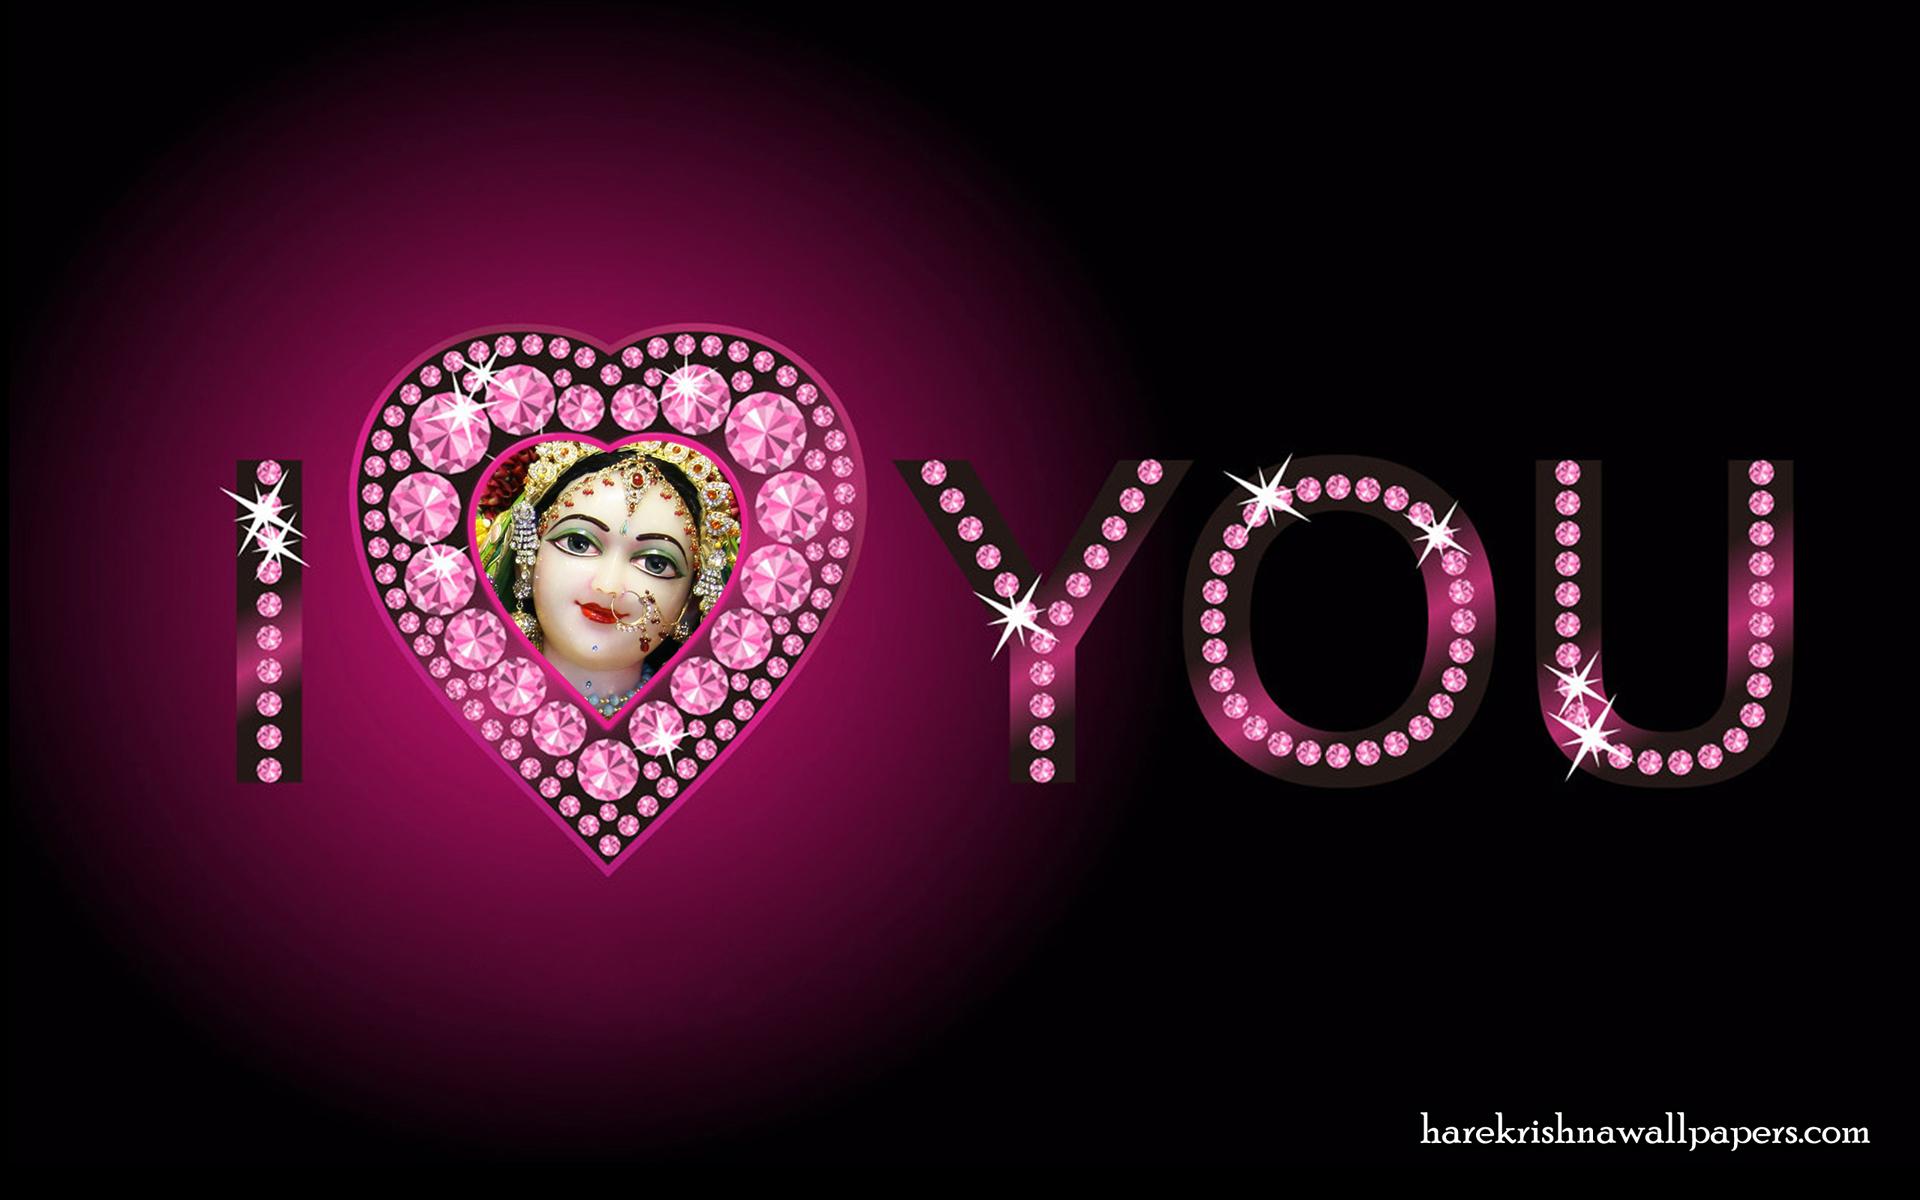 I Love You Radharani Wallpaper (015) Size 1920x1200 Download